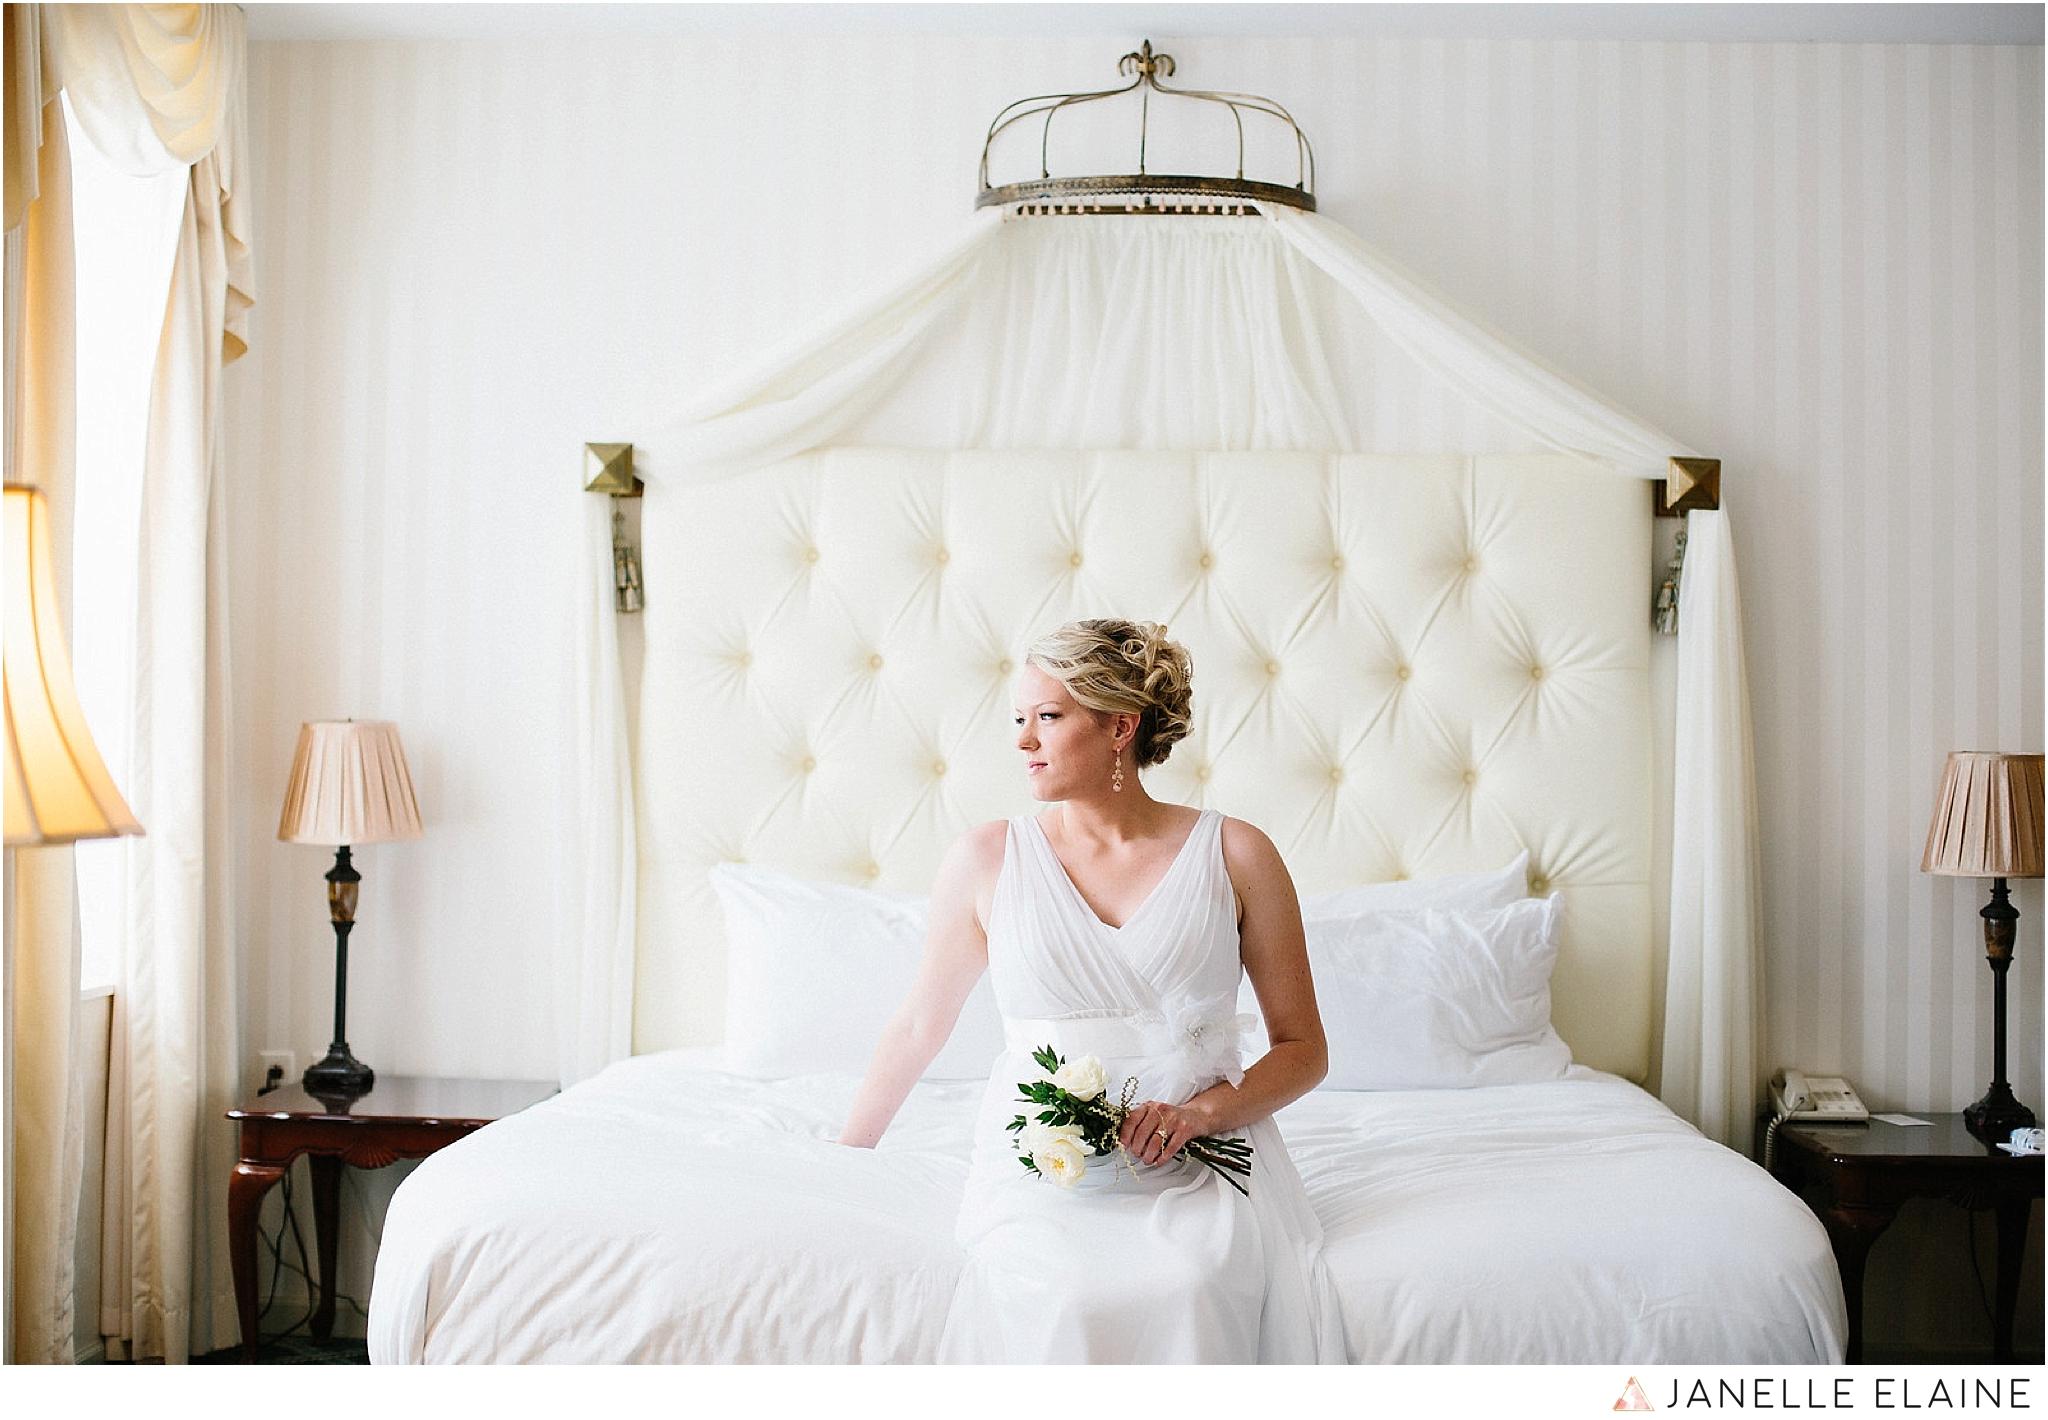 janelle elaine photography-landmark inn-marquette-mi-wedding-169-X3.jpg